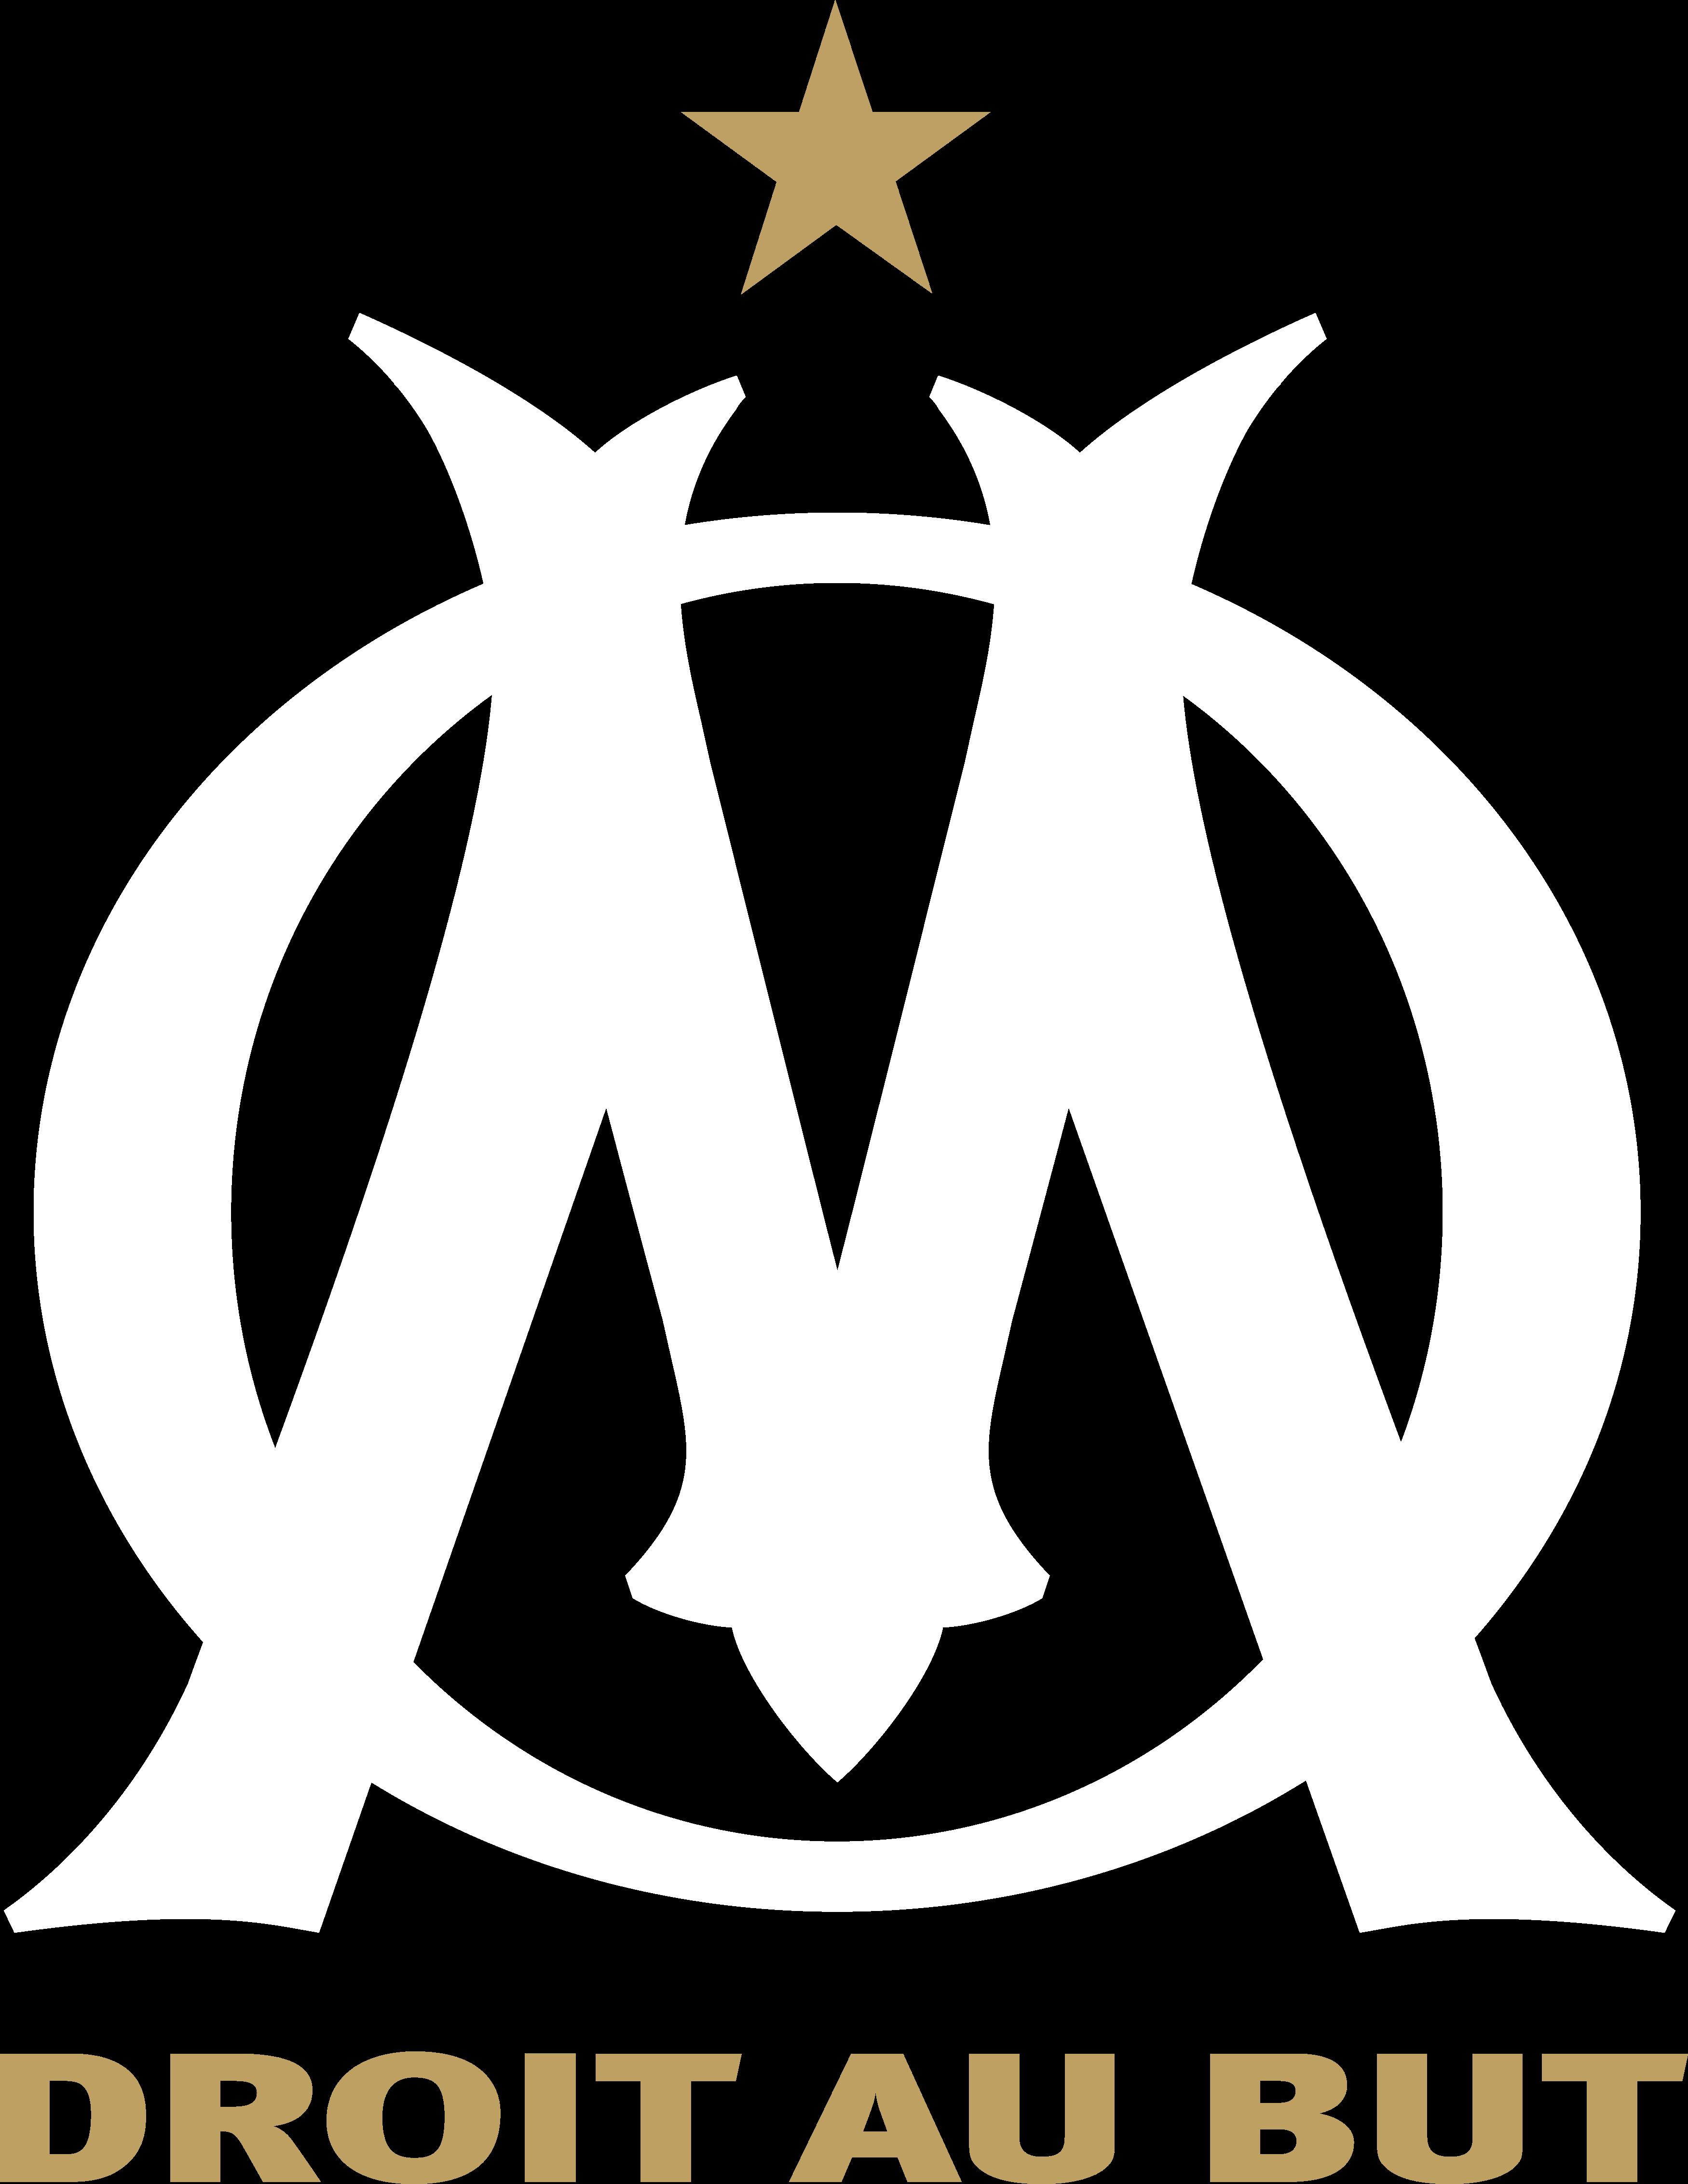 olympique de marseille 1 - Olympique de Marseille Logo